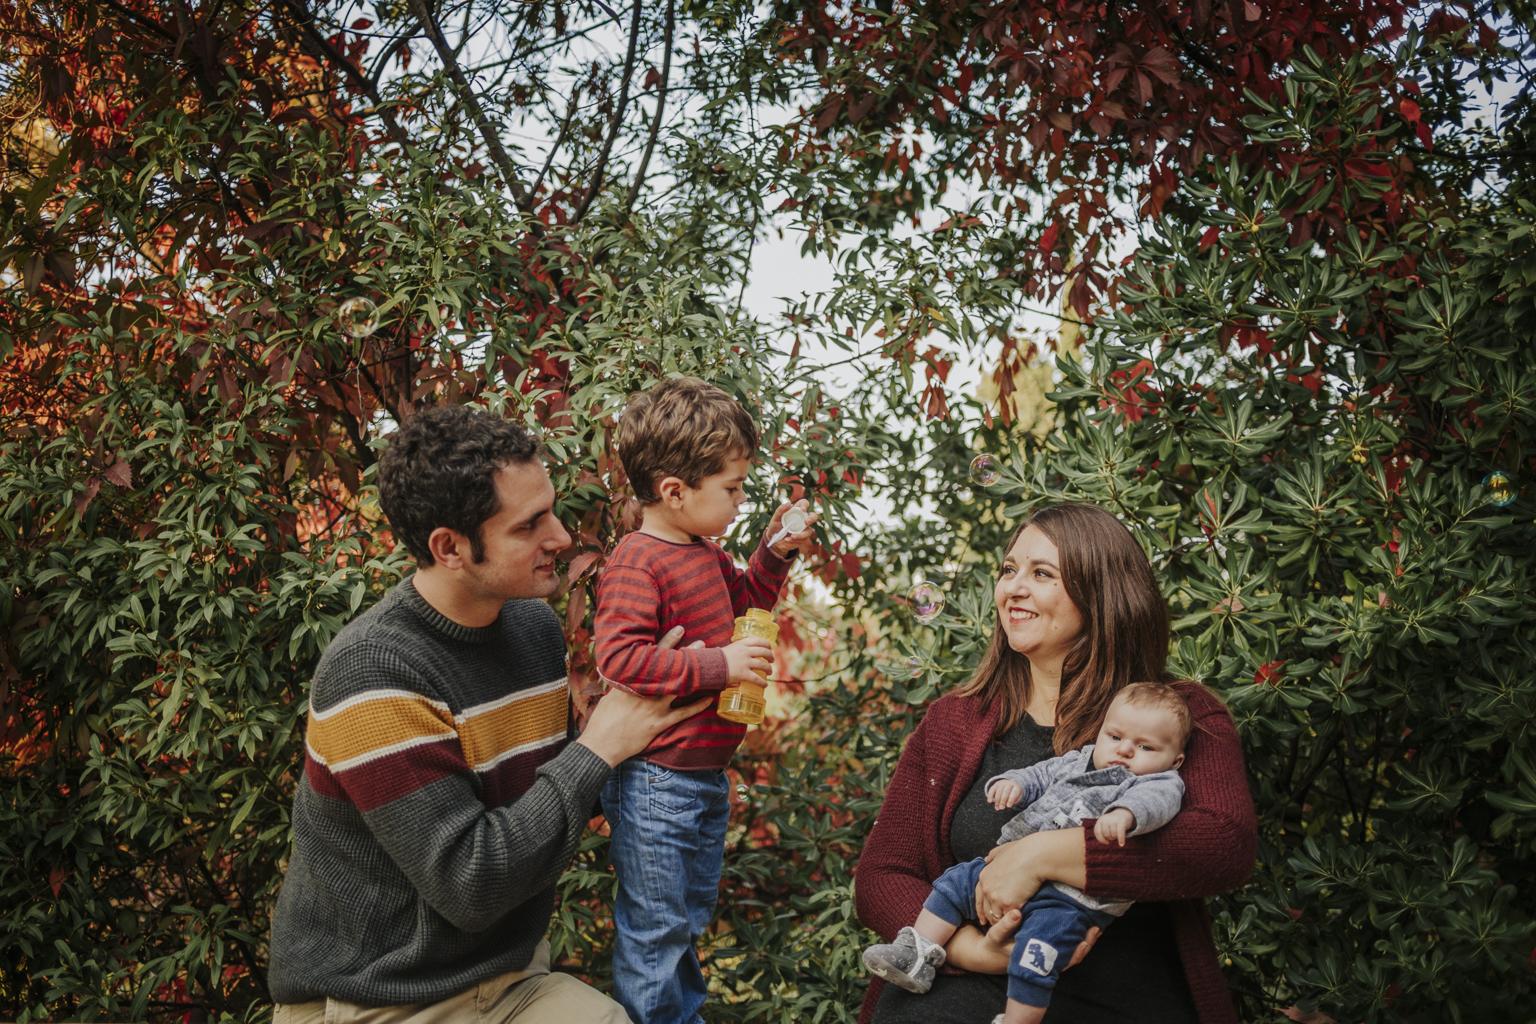 fotógrafo de familia Barcelona :: Parque de Laribal :: Fotografía familiar montjuic :: fotógrafo de familia Sant Cugat :: fotos de familia natural